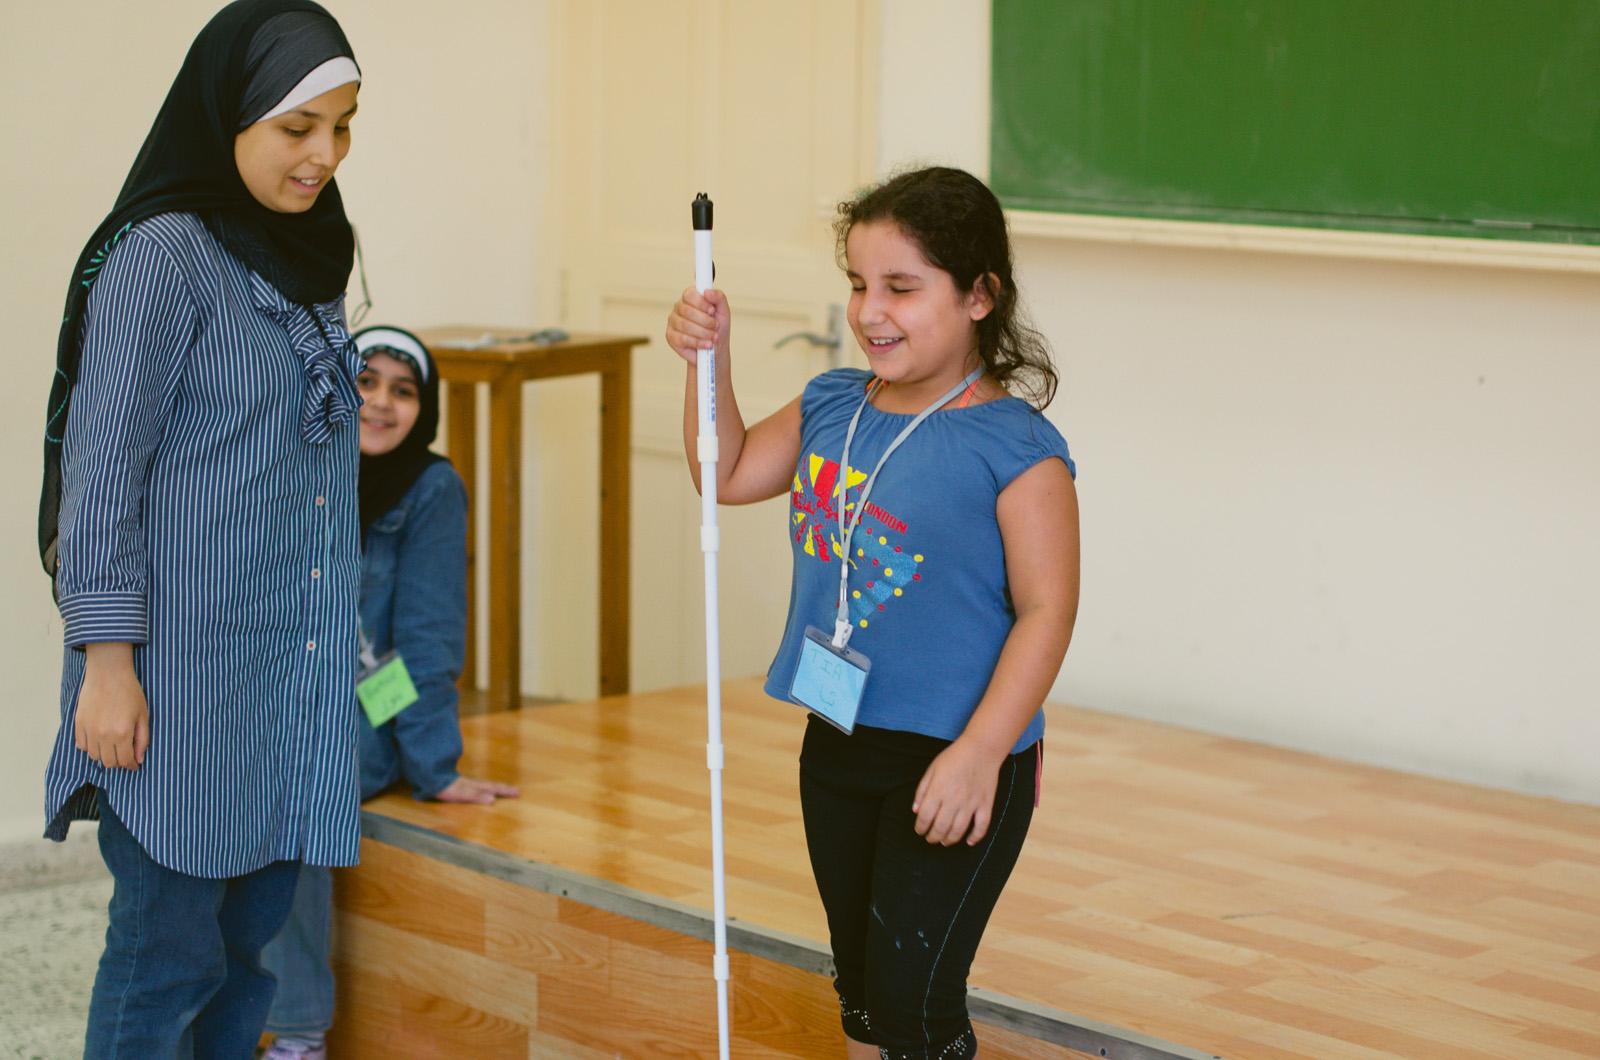 Sara Minkara (left) supervises a girl learning how to use a white cane.